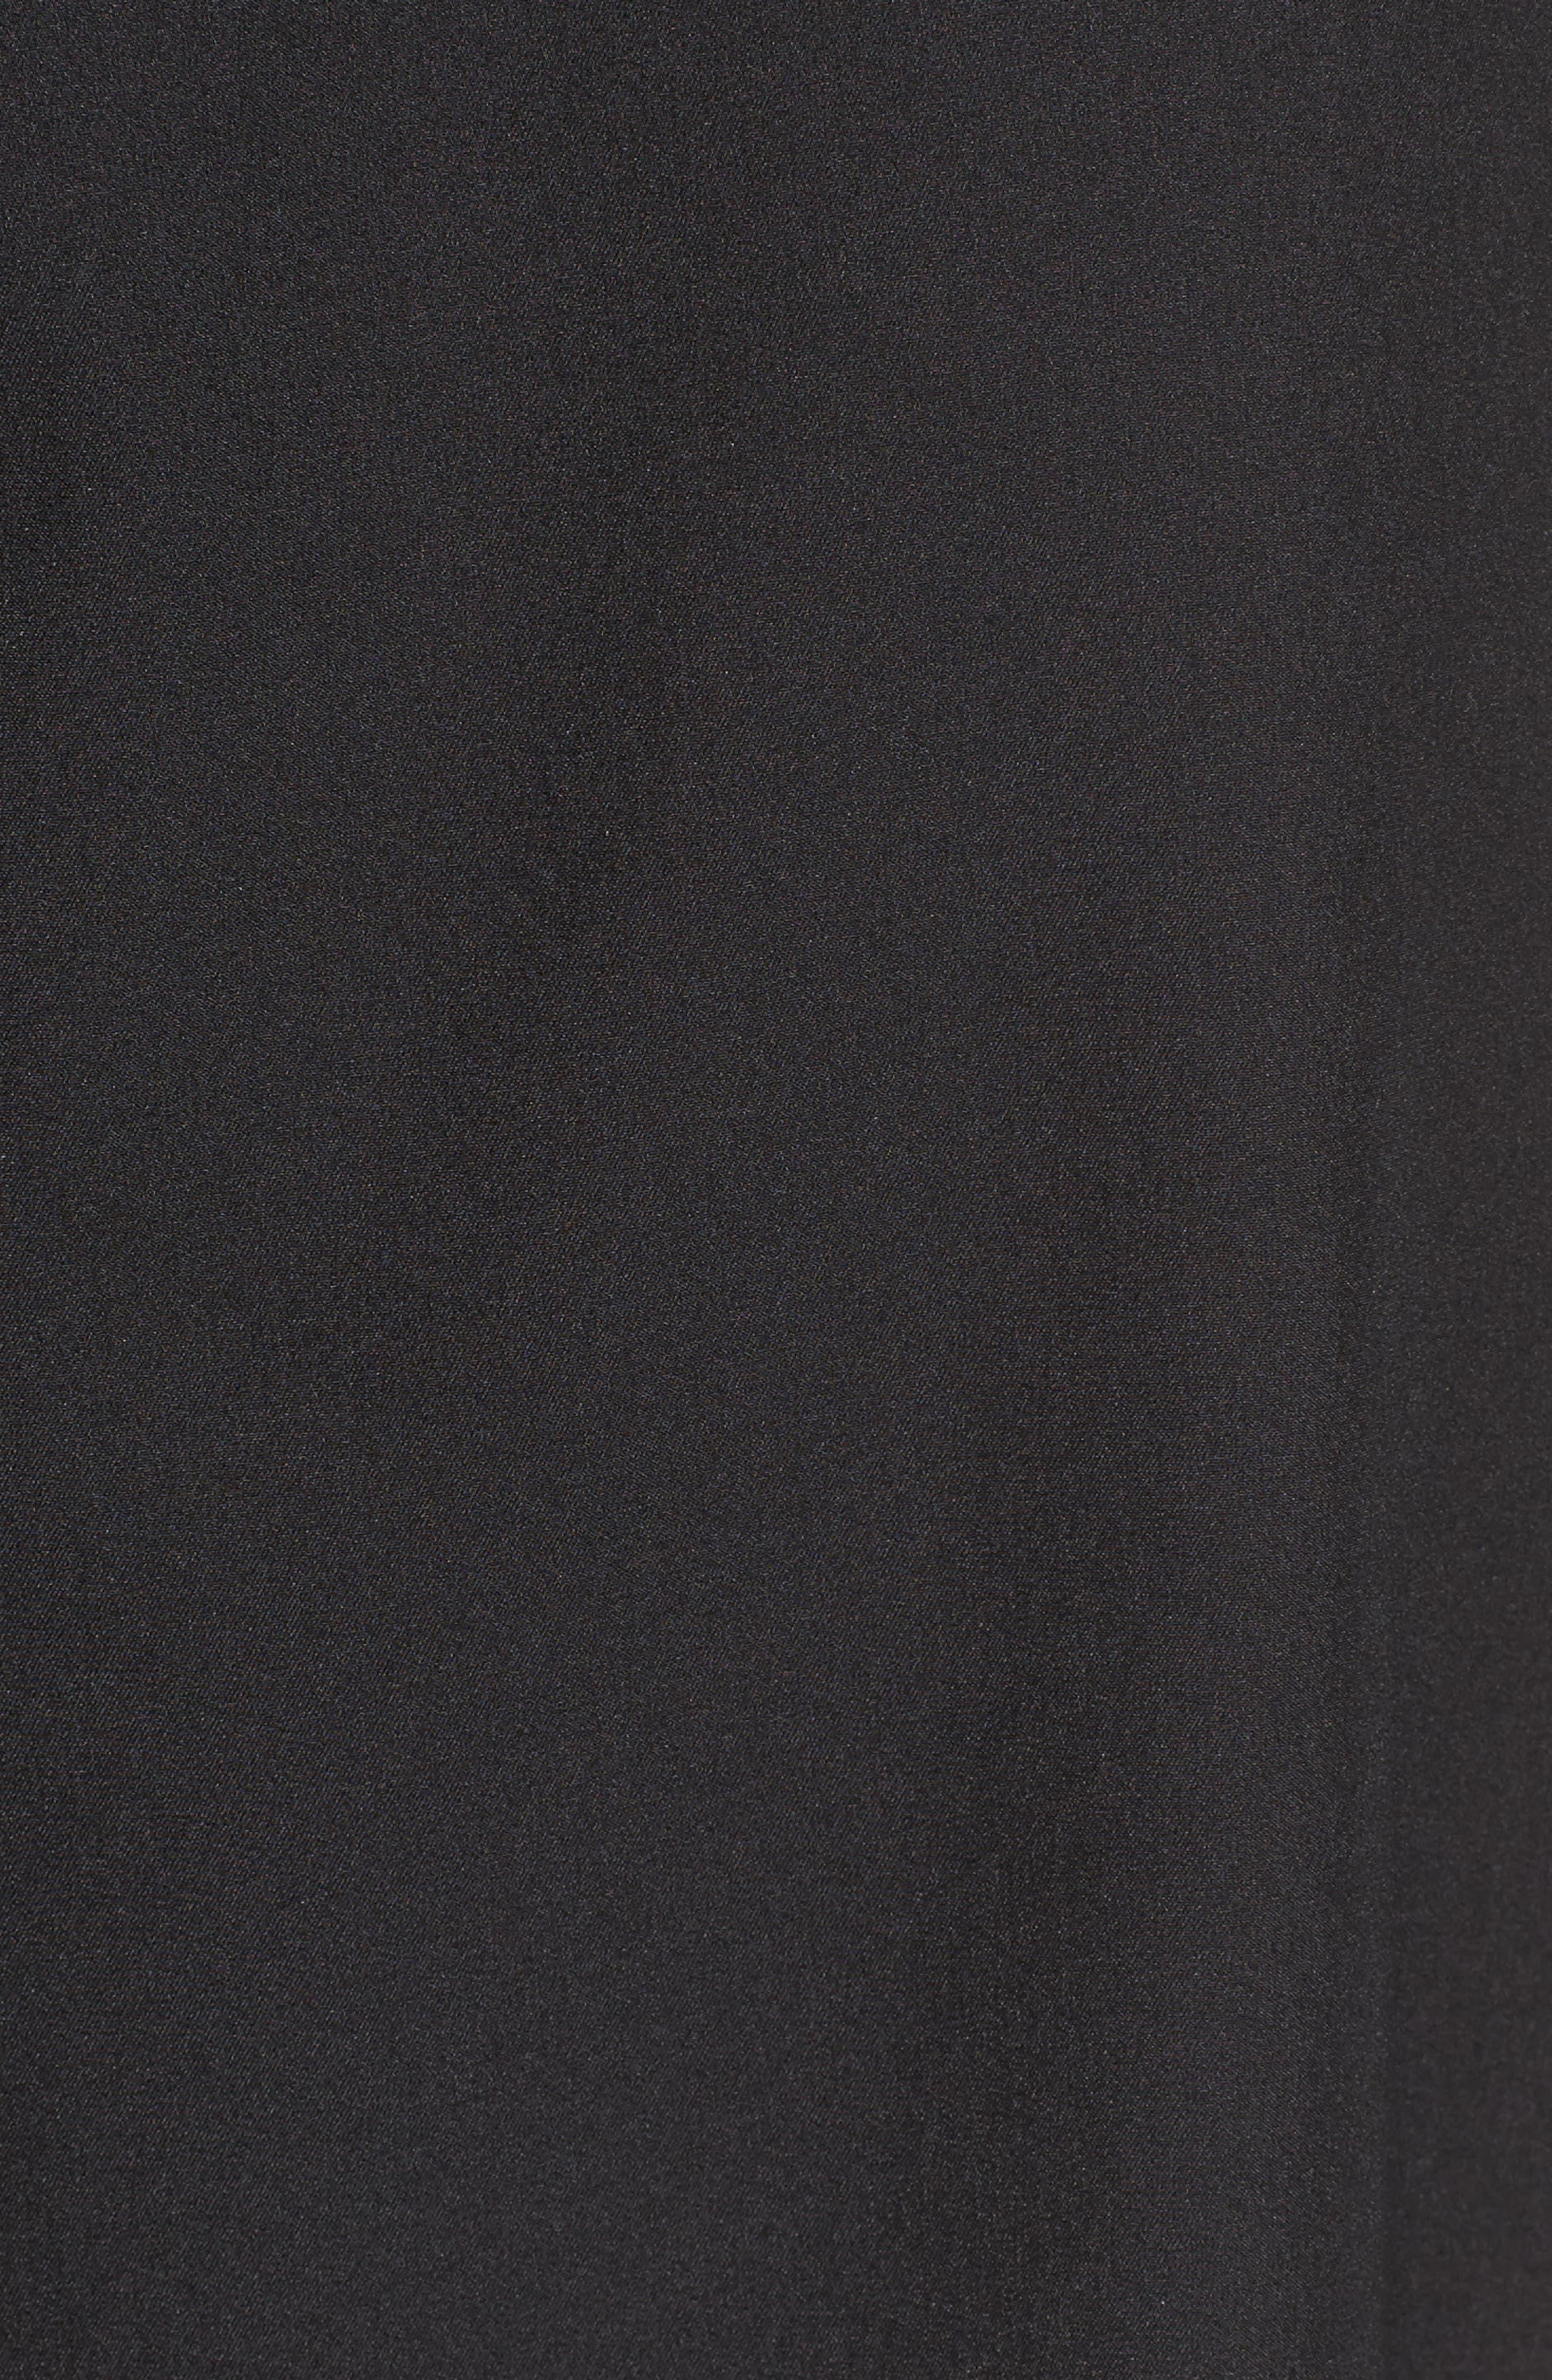 Superfreak Board Shorts,                             Alternate thumbnail 5, color,                             Black